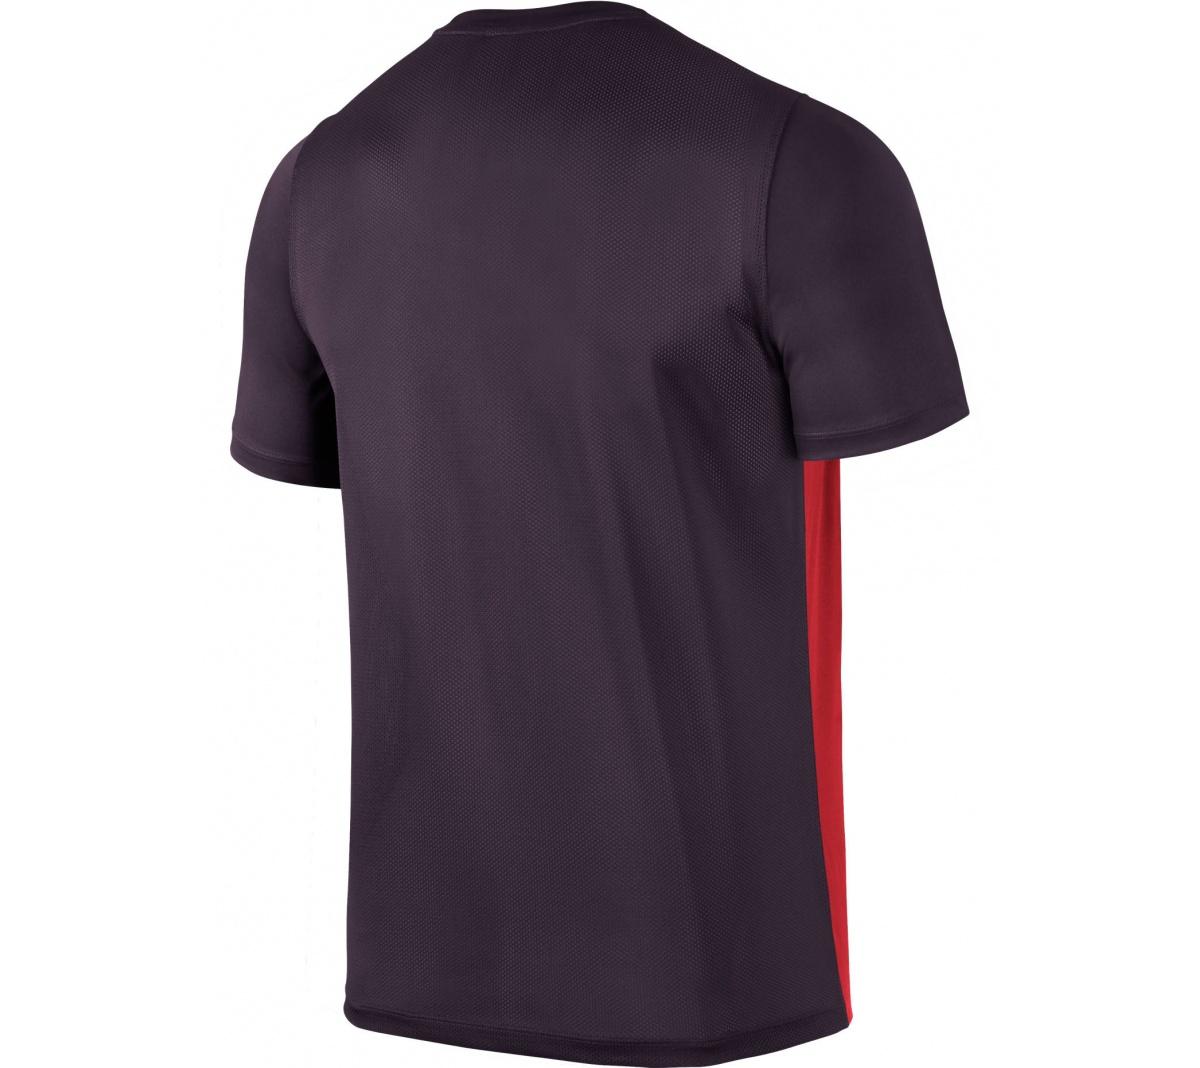 Camisa Nike Academy SS Training Vm - Mundo do Futebol 08bb60f3ea218